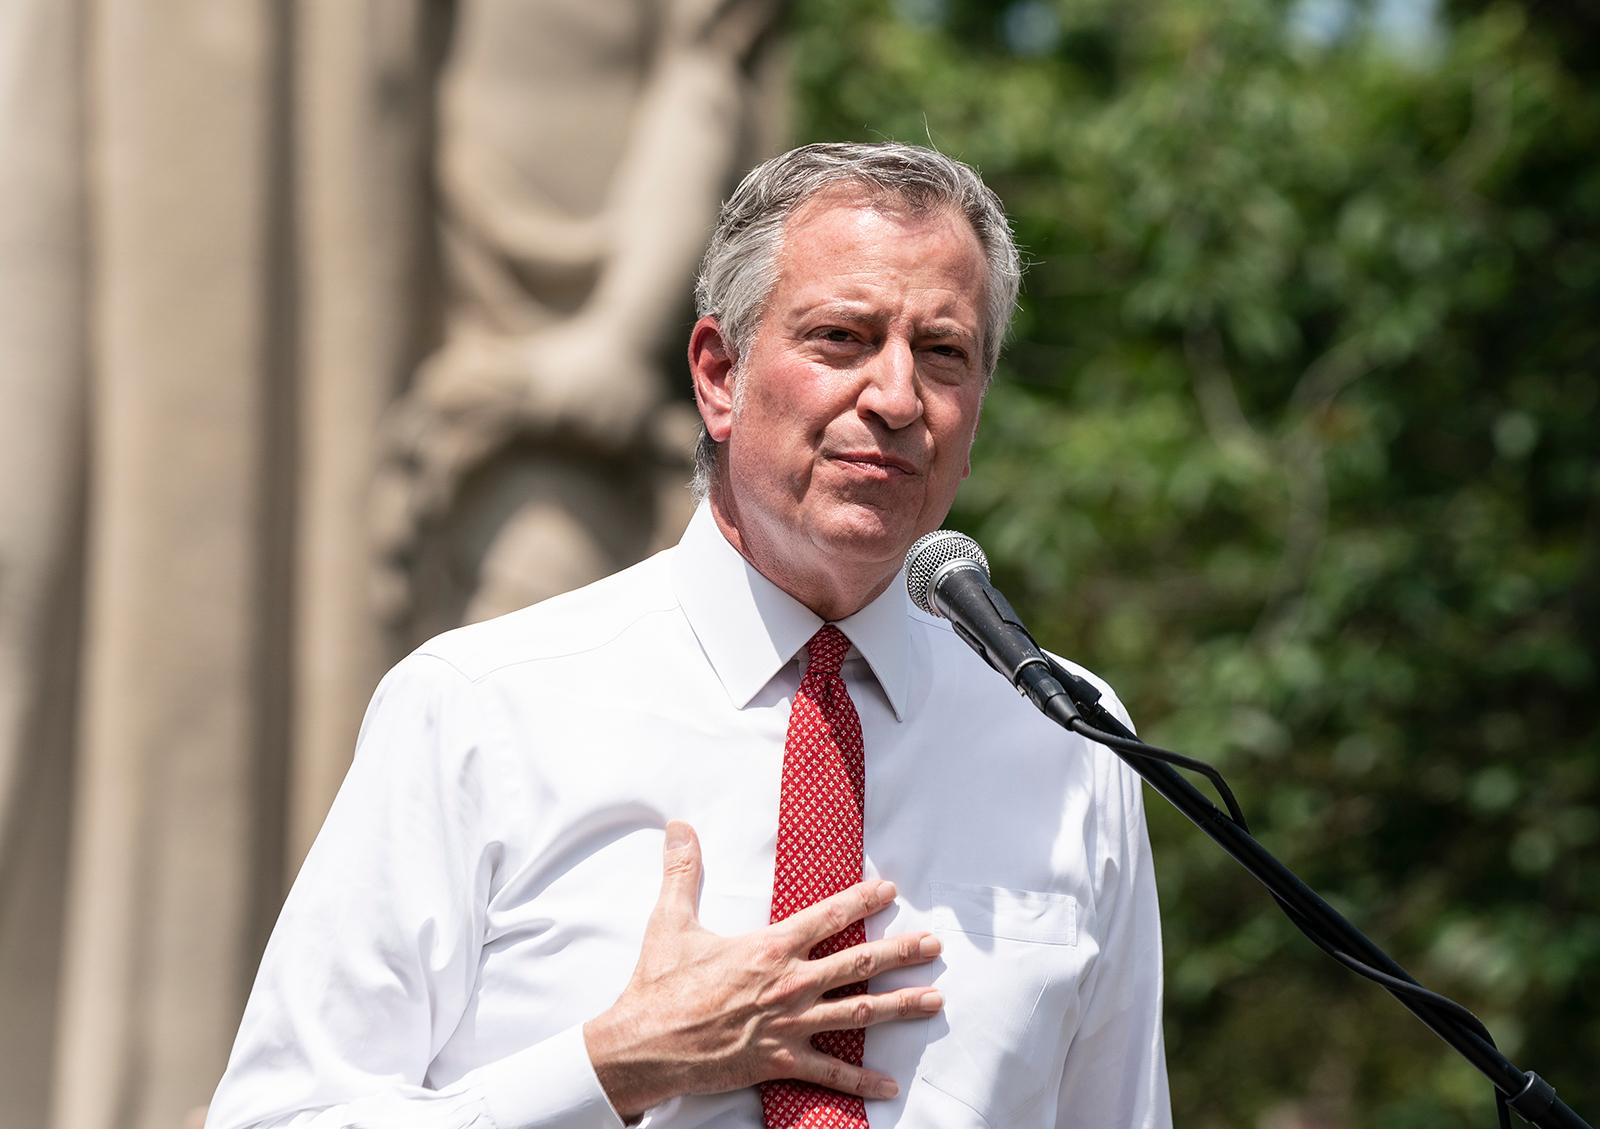 Mayor Bill de Blasio speaks during memorial service for George Floyd in New York on Thursday, June 4.